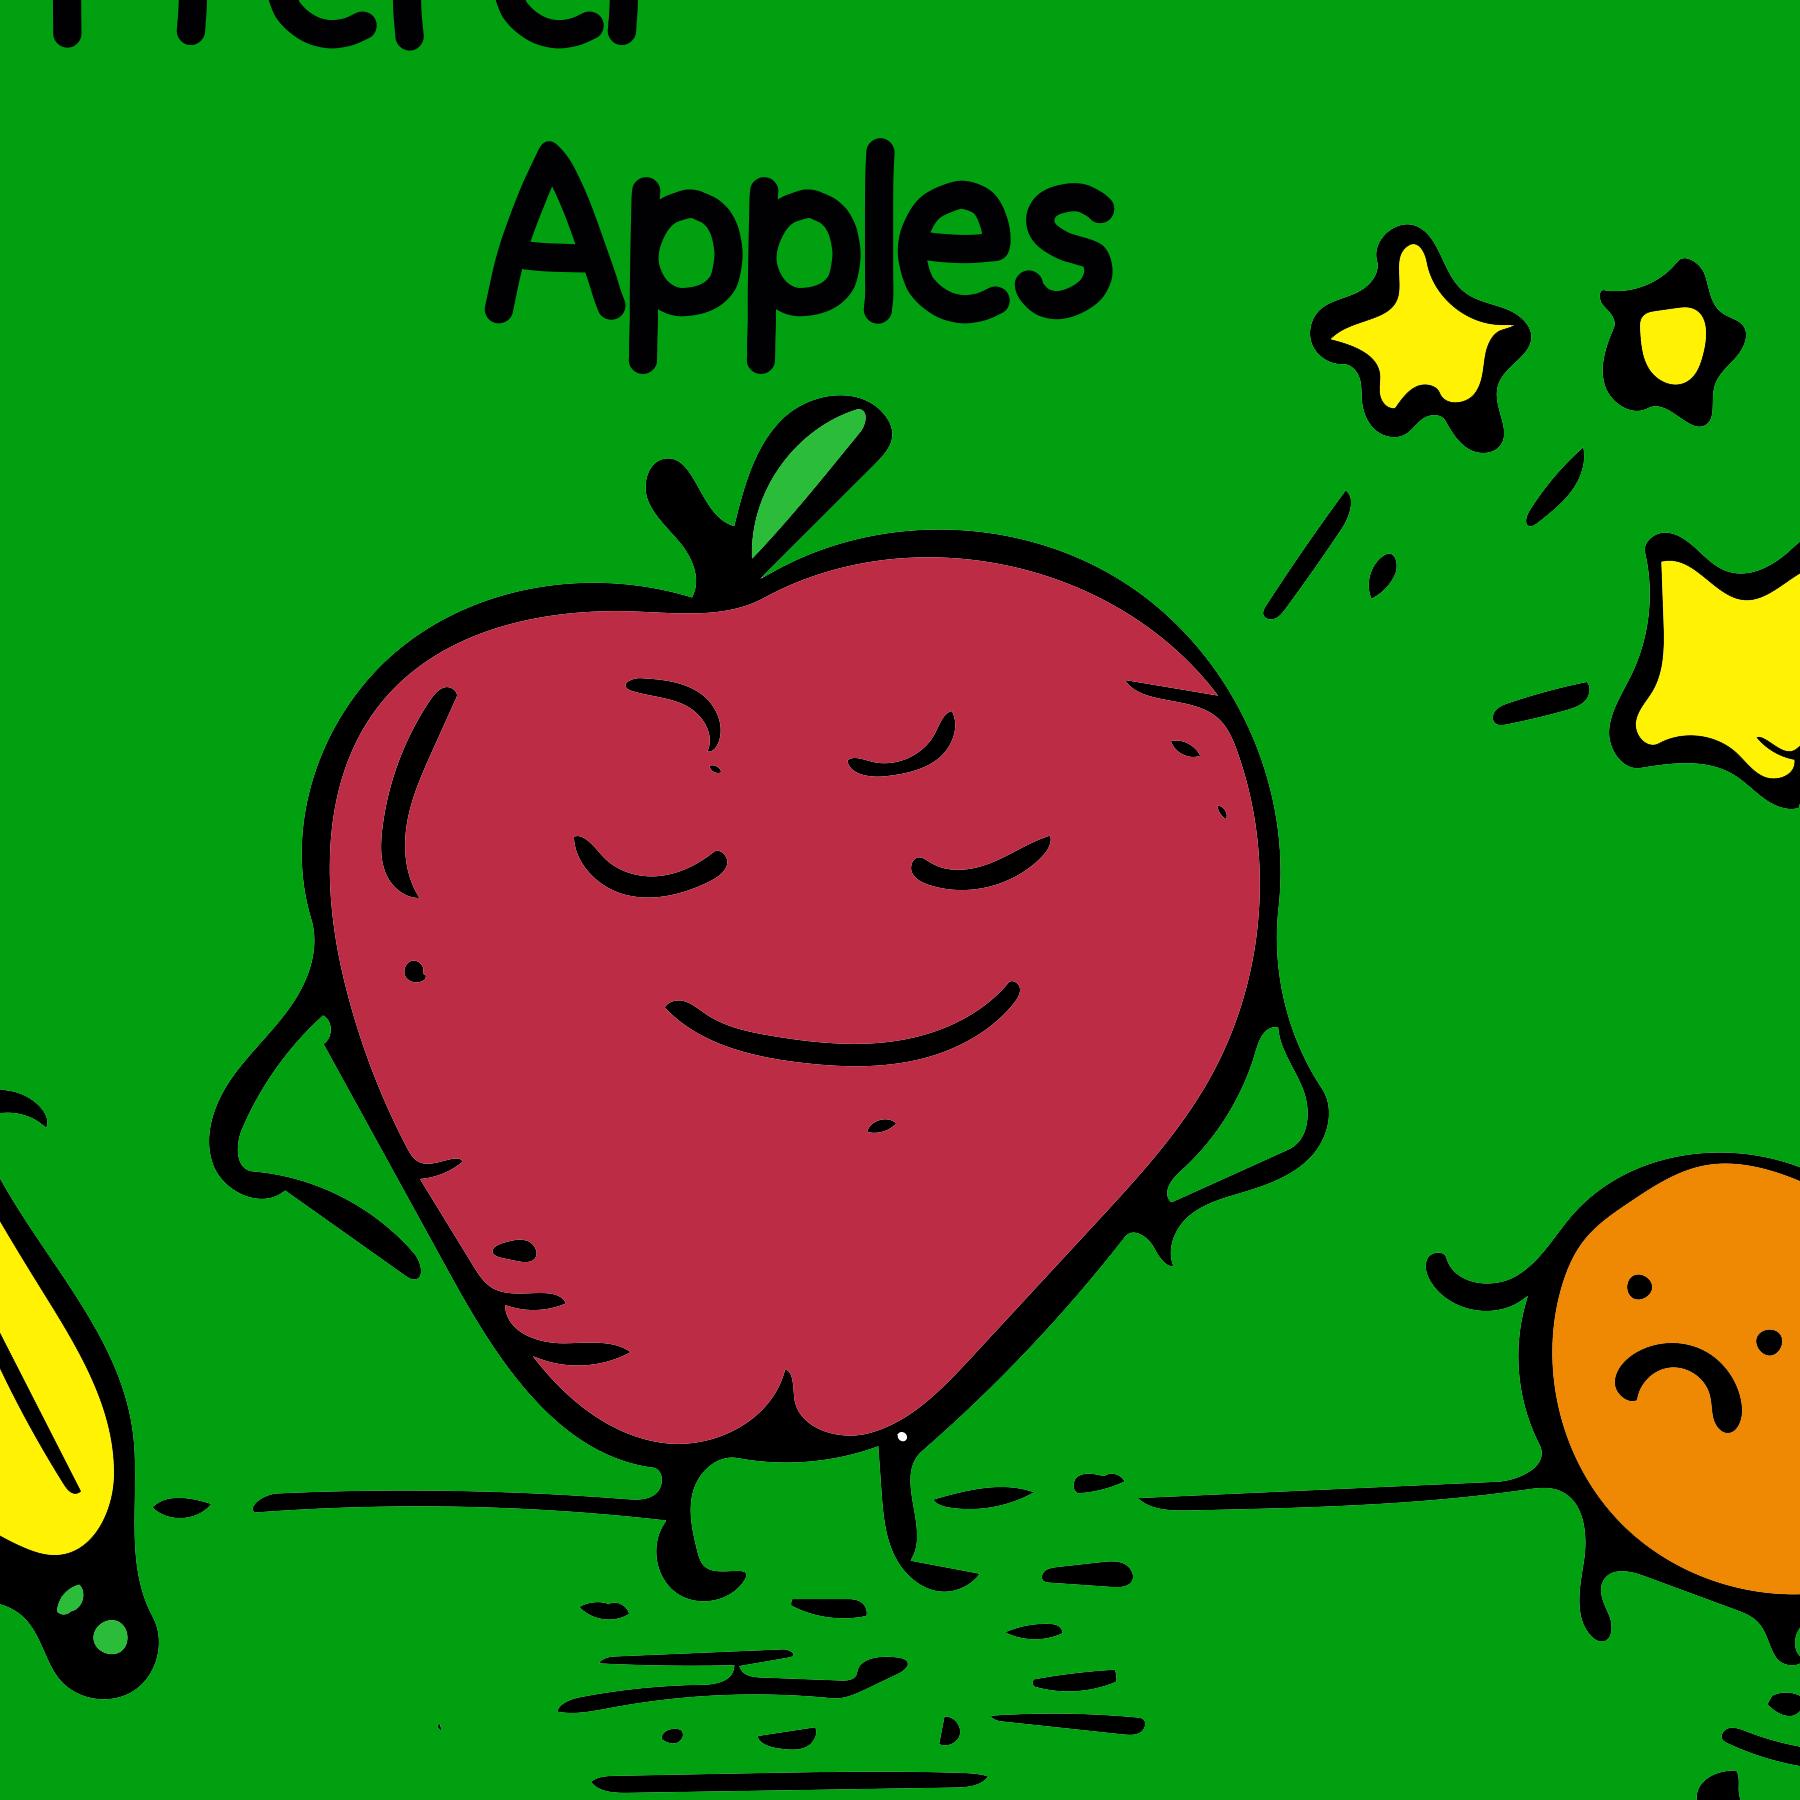 Teachers Prefer Apples